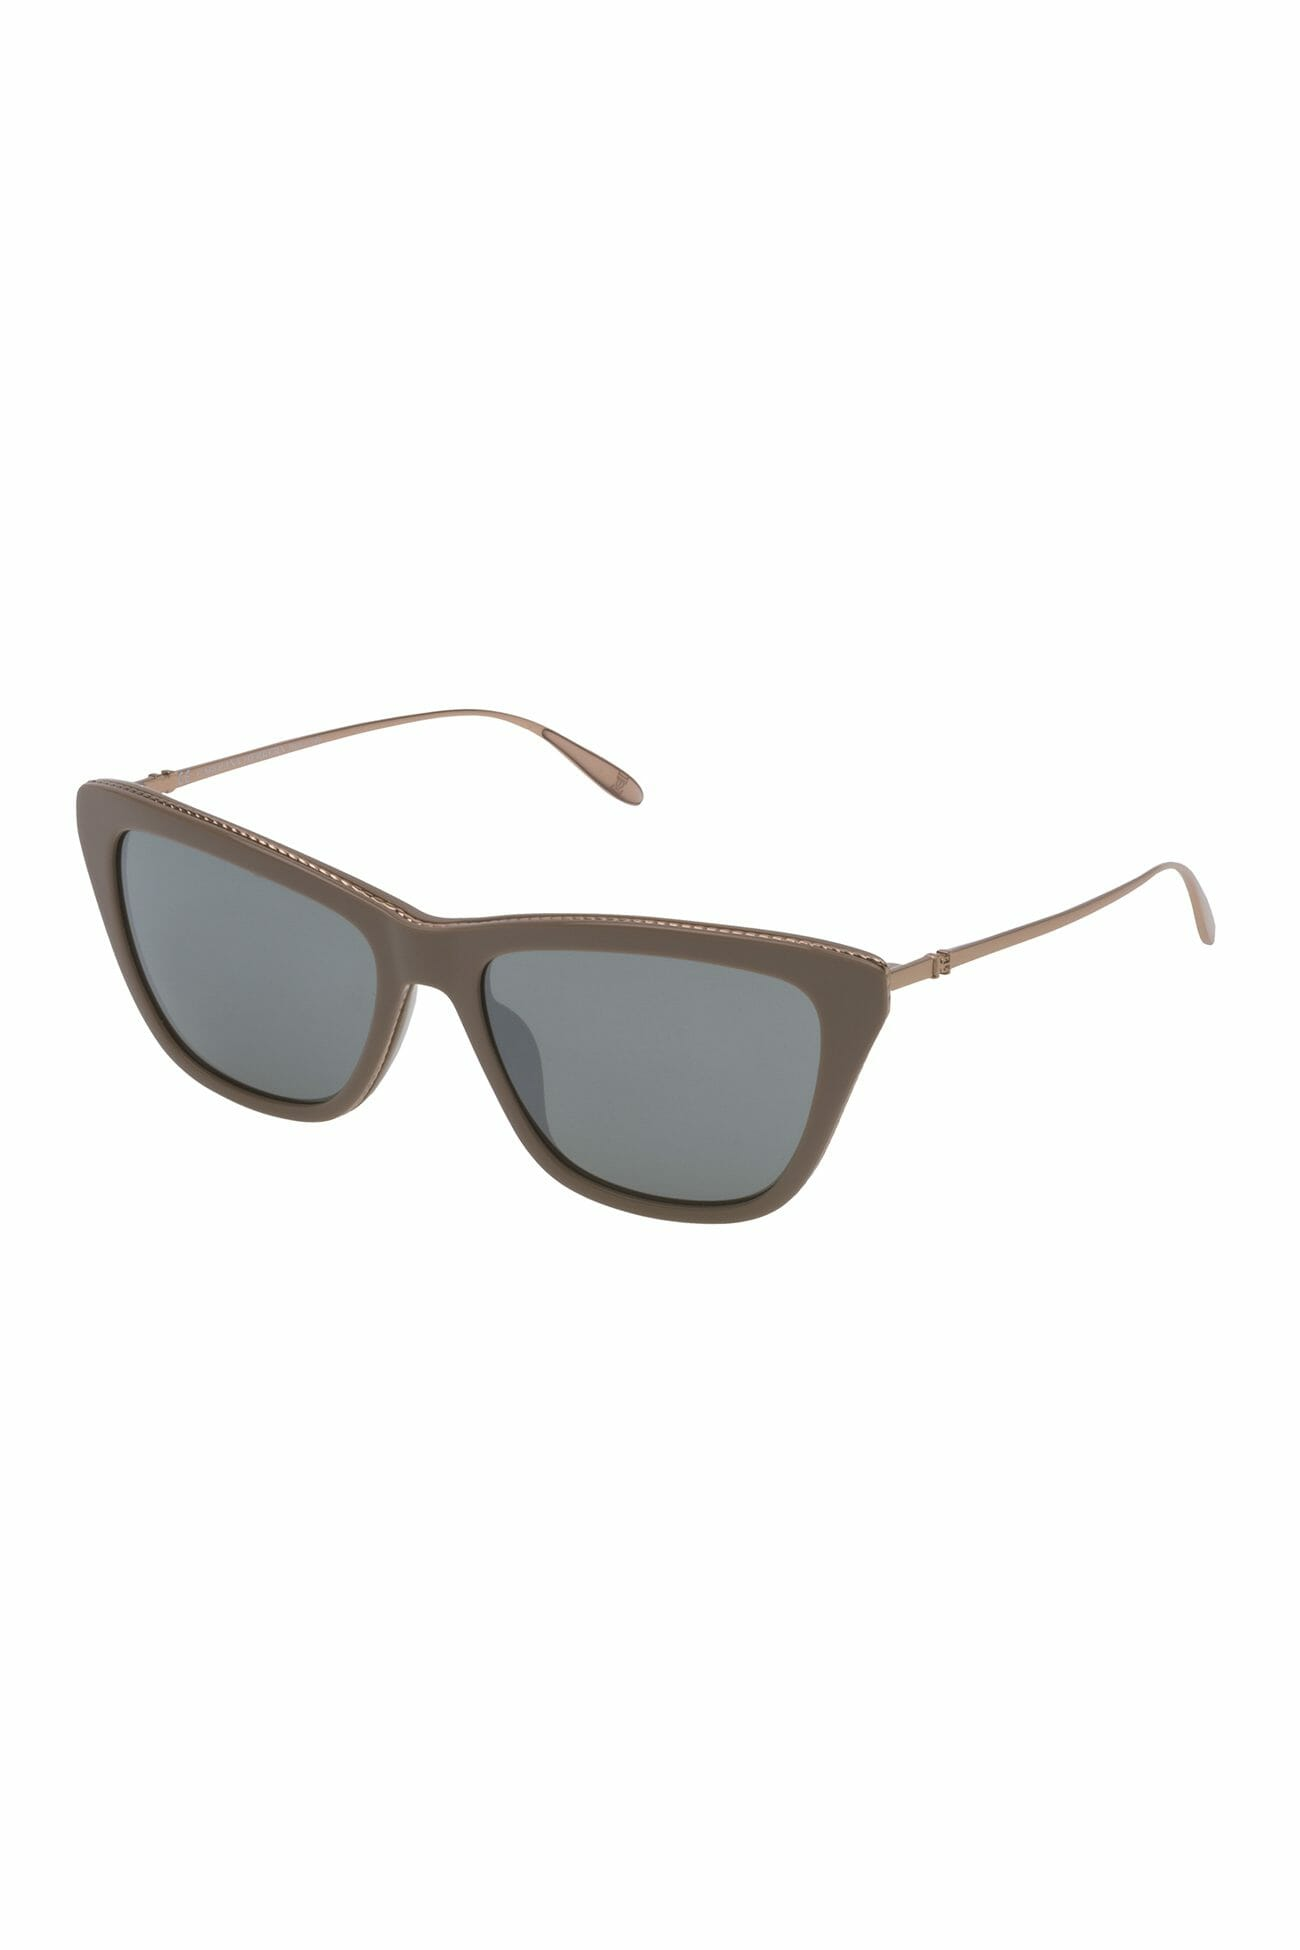 Carolina-Herrera-New-York-Eyewear-ReferenceV55X-01